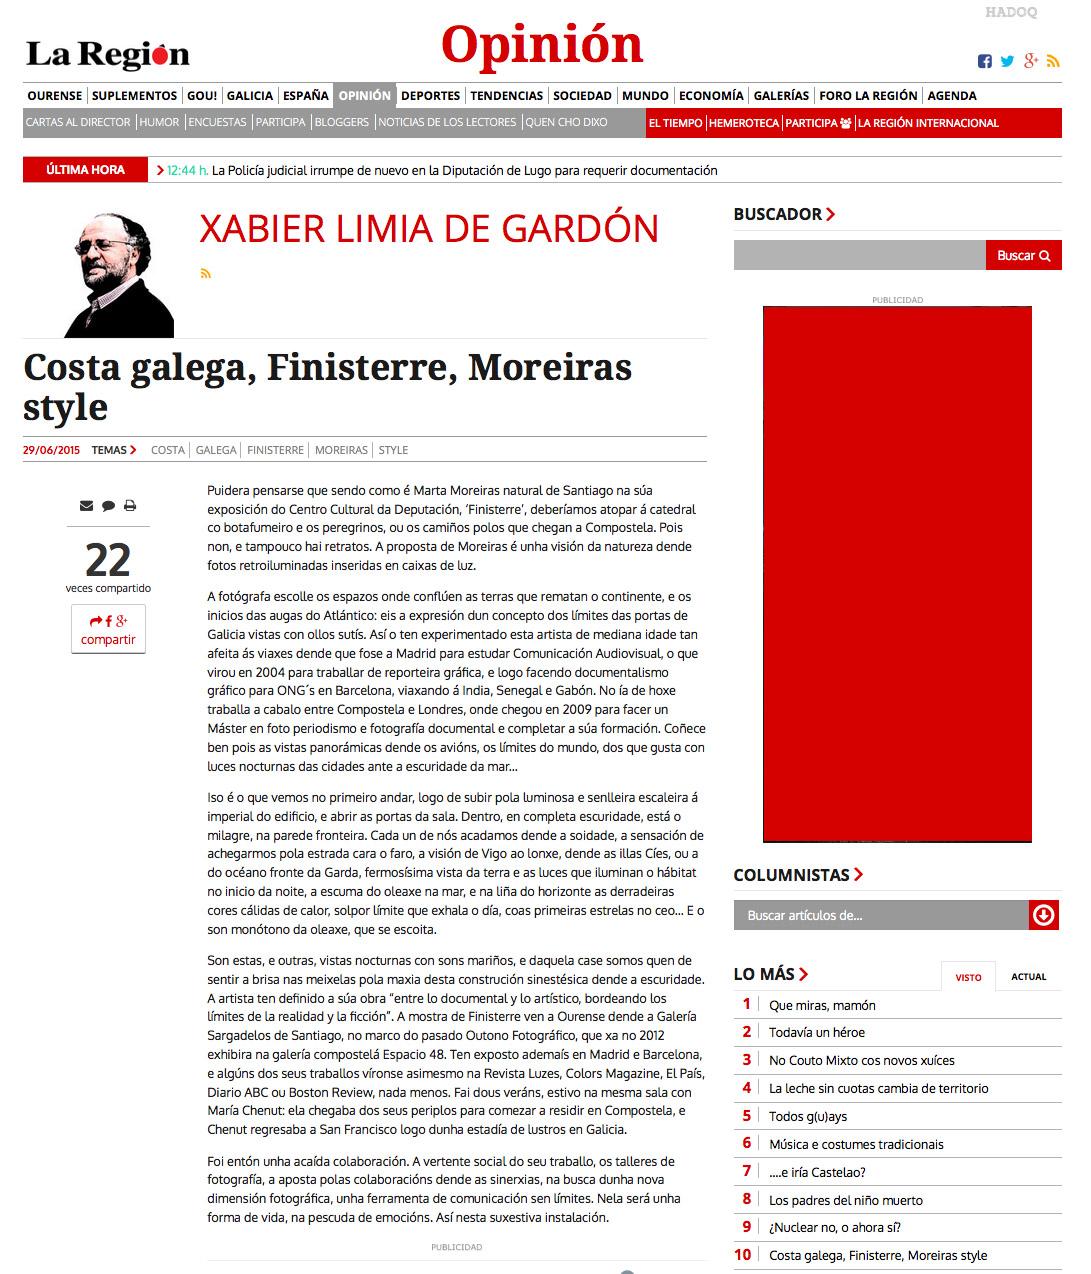 La Region_Junio 2015_72ppp